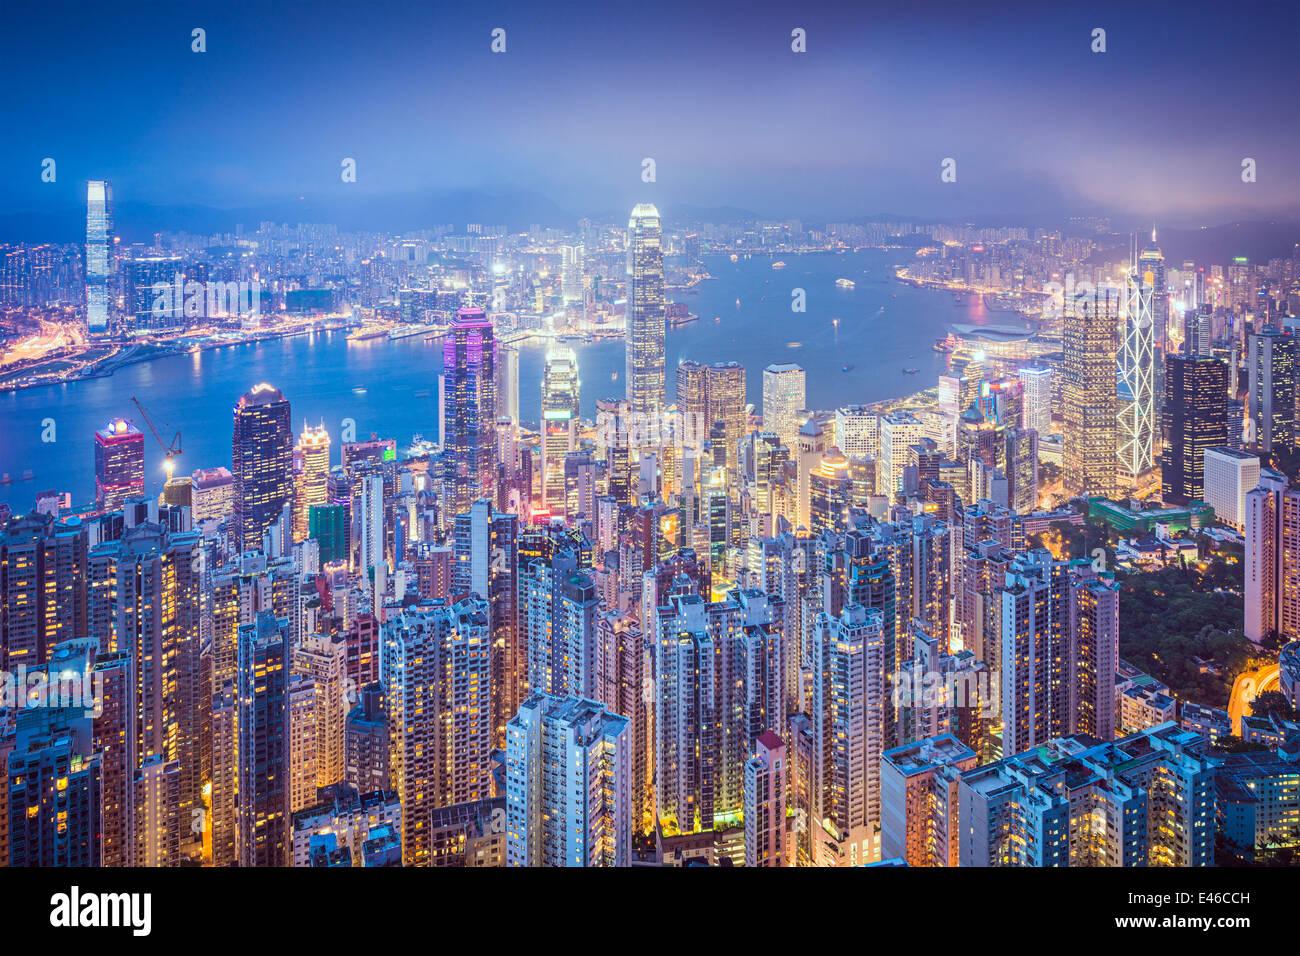 Hong Kong, China city skyline from Victoria Peak. - Stock Image